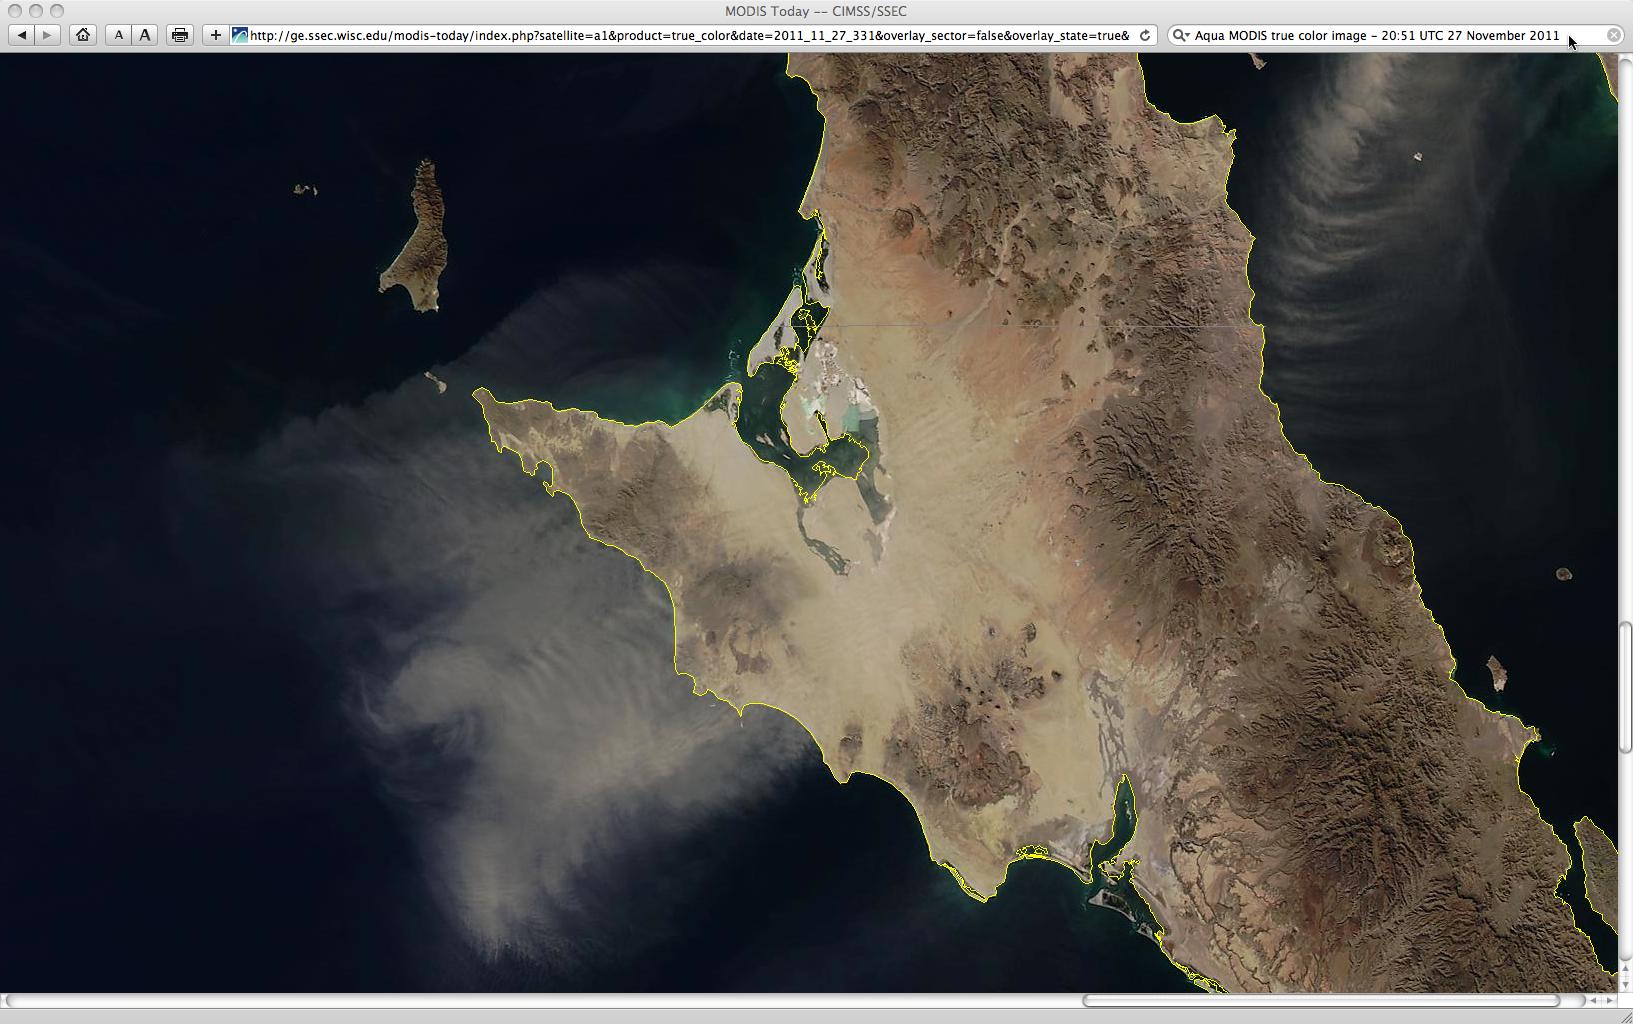 MODIS true color Red/Green/Blue (RGB) image